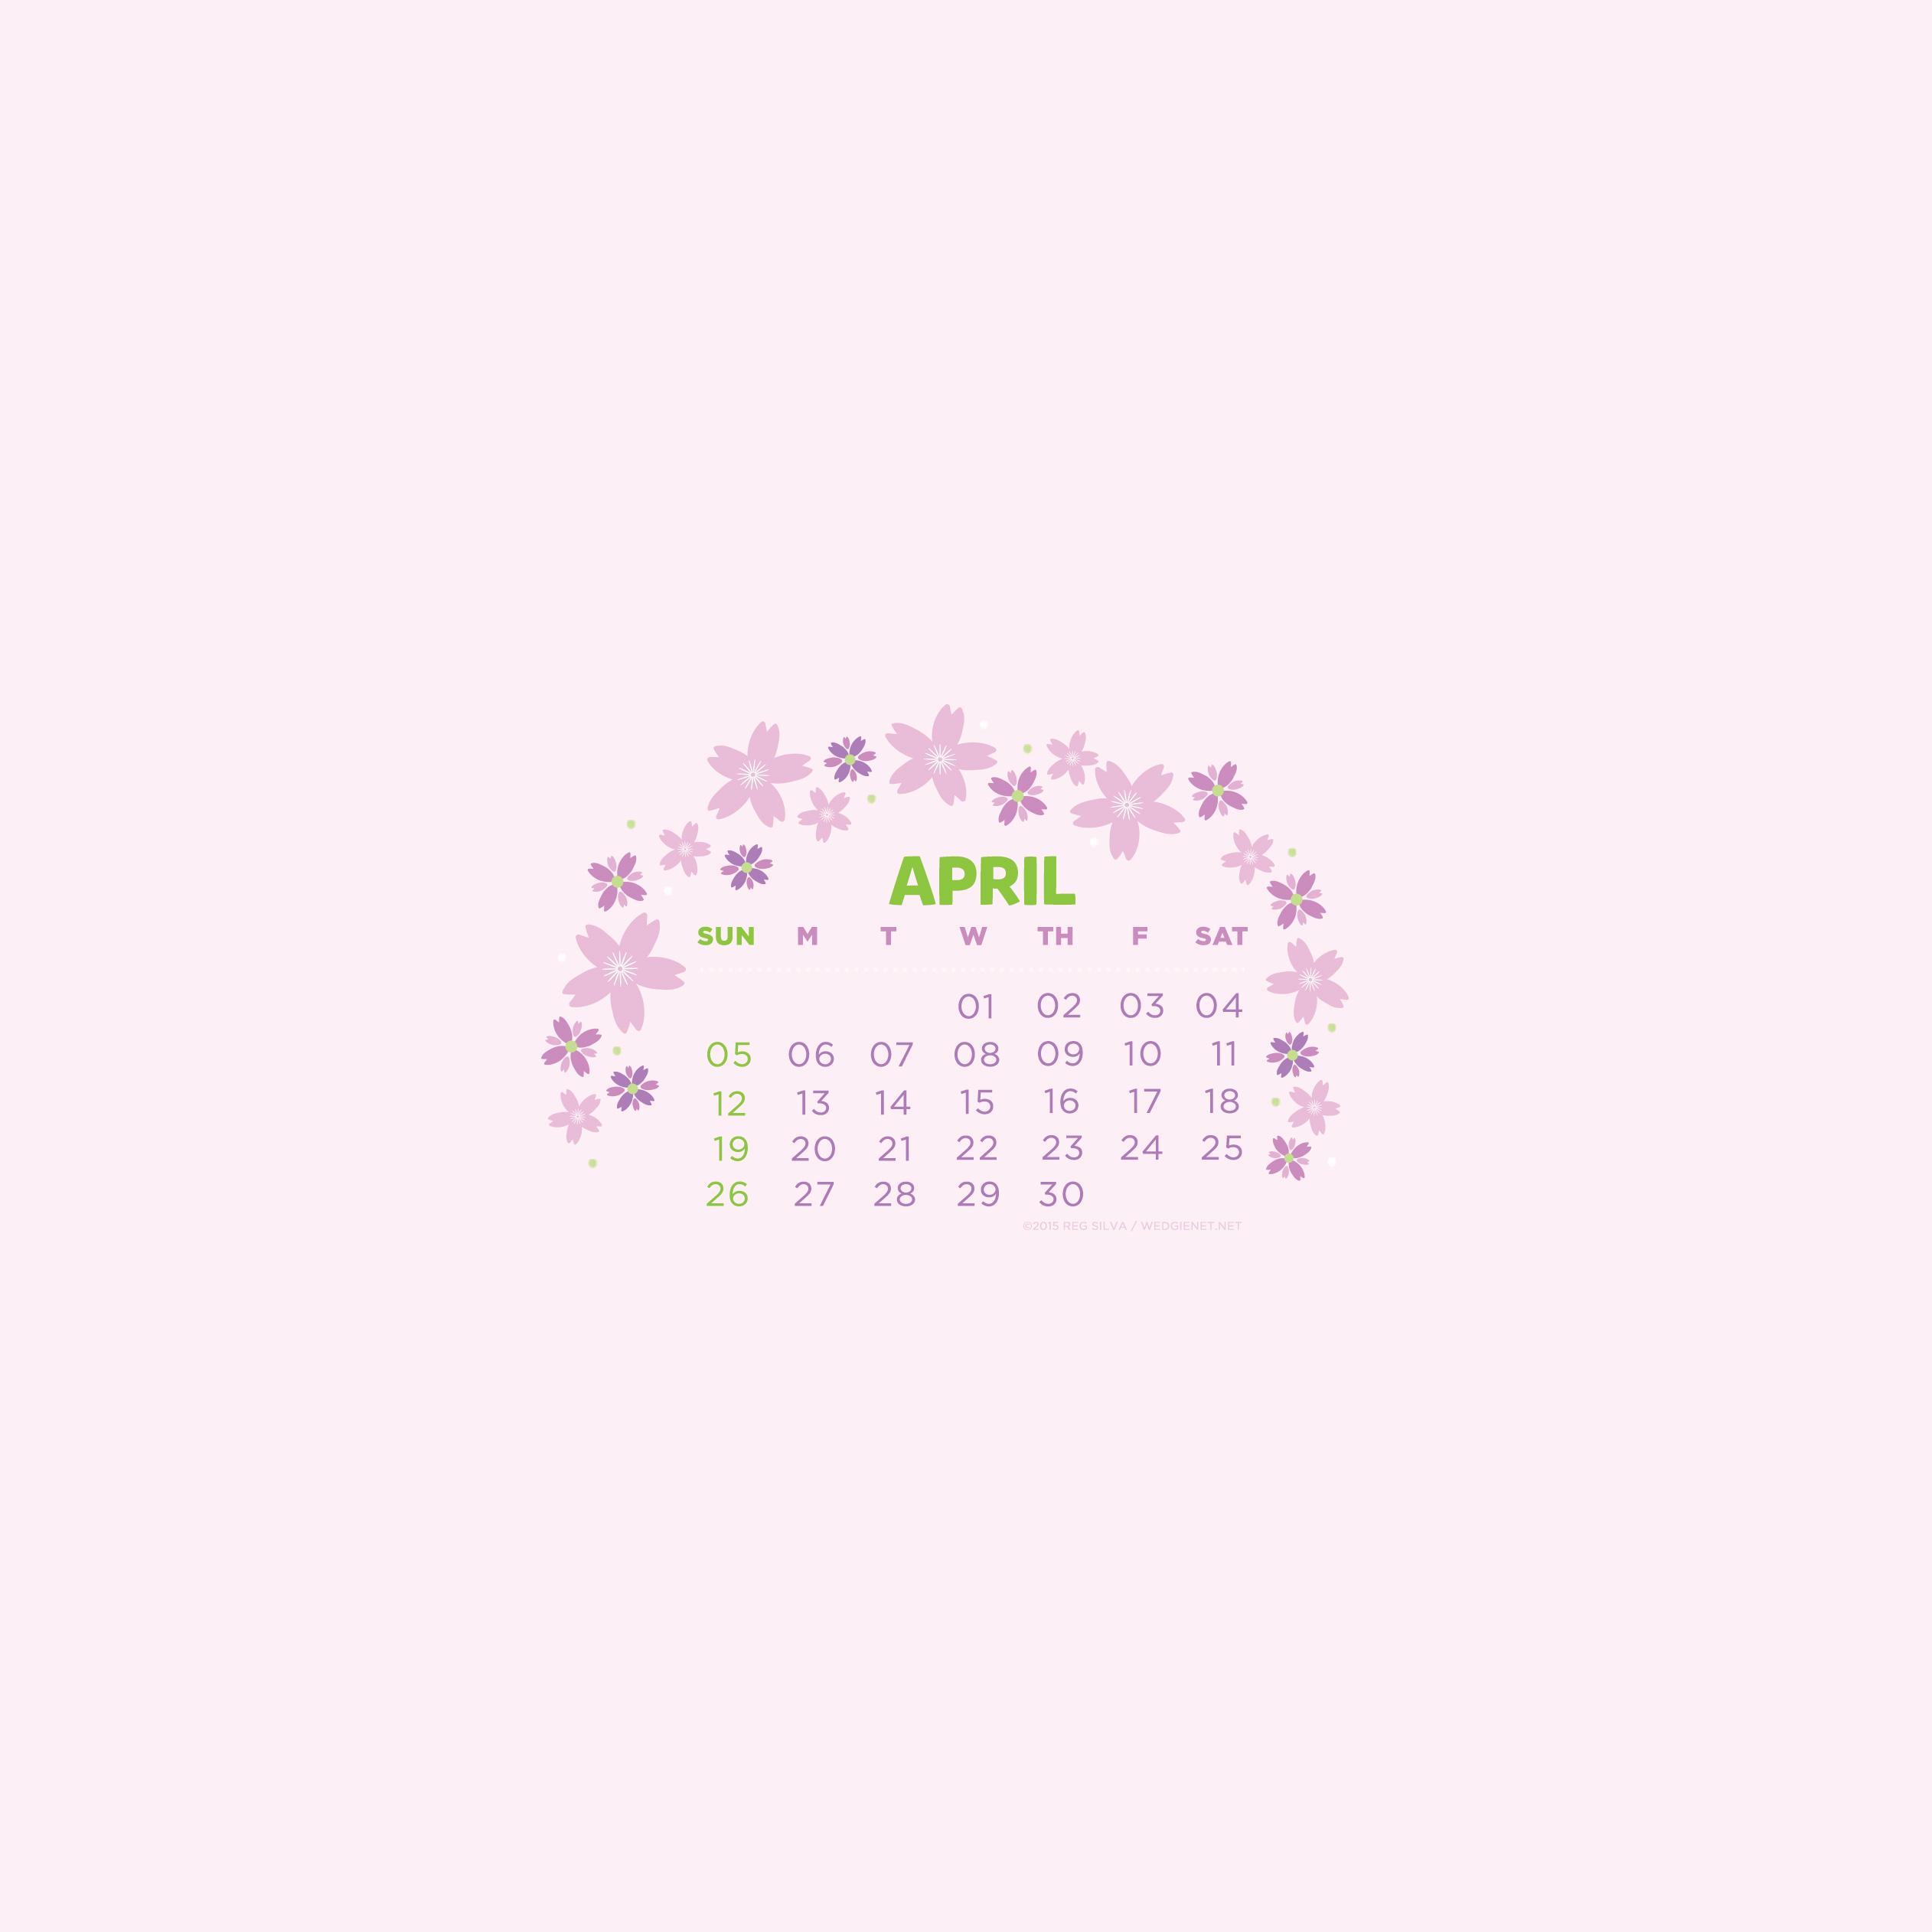 Free Download Desktop Iphone Ipad Lock Screen Calendar in Calendar On Lock Screen Iphone